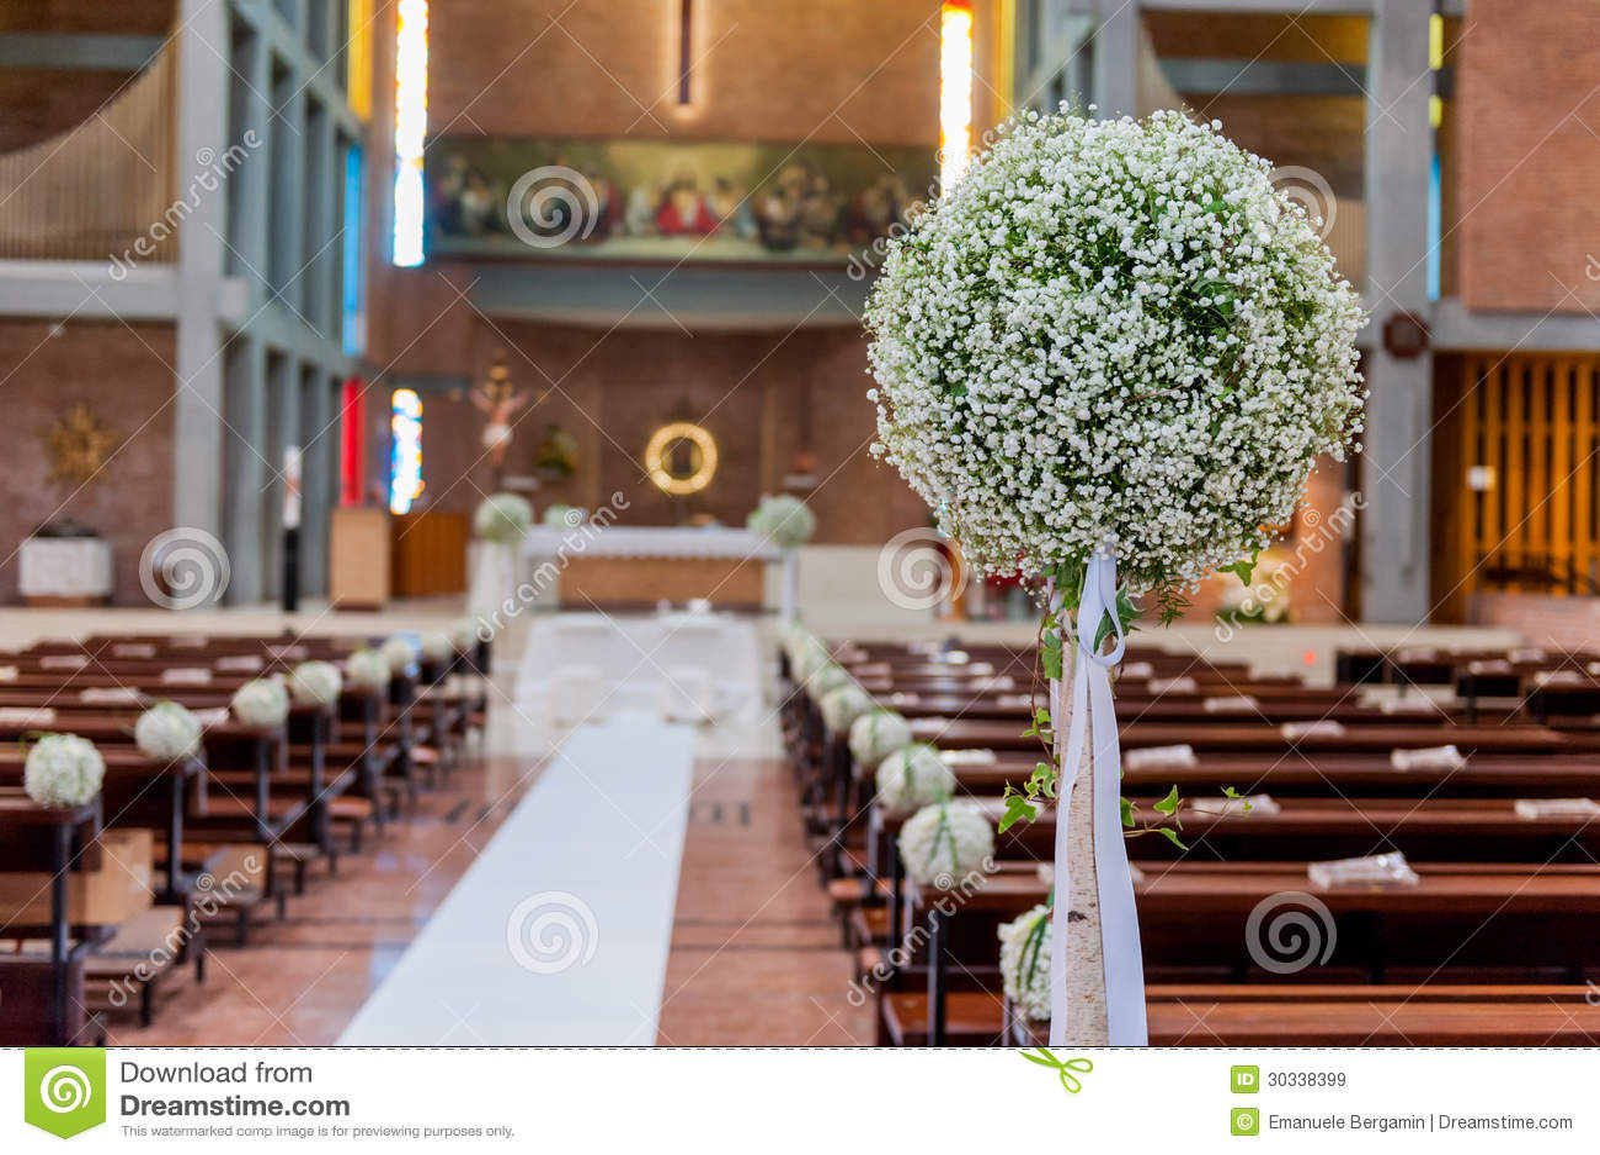 White flowers in church stock image. Image of bricks - 30338399